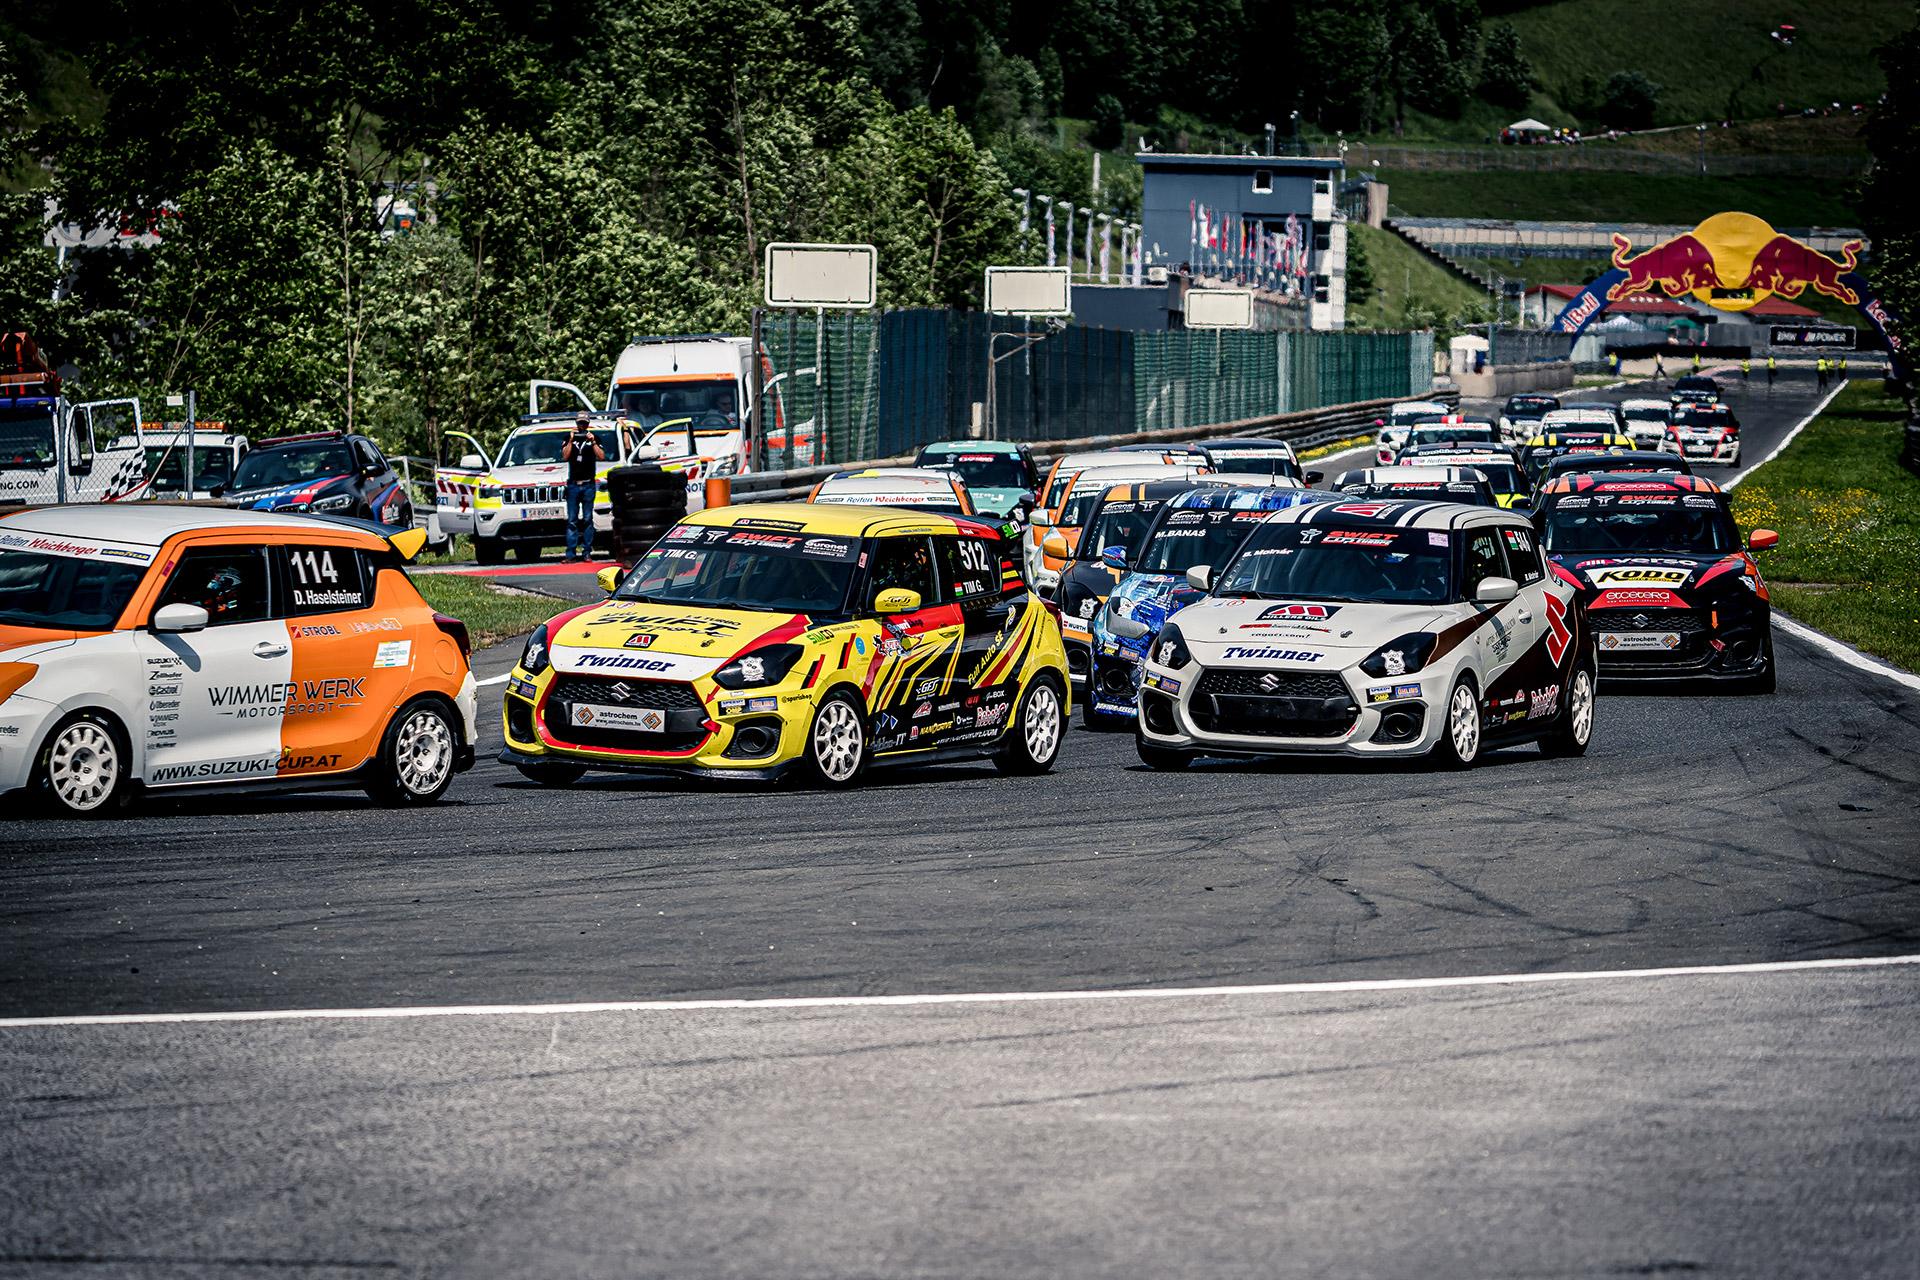 timg_2021_salzburgring7.jpg